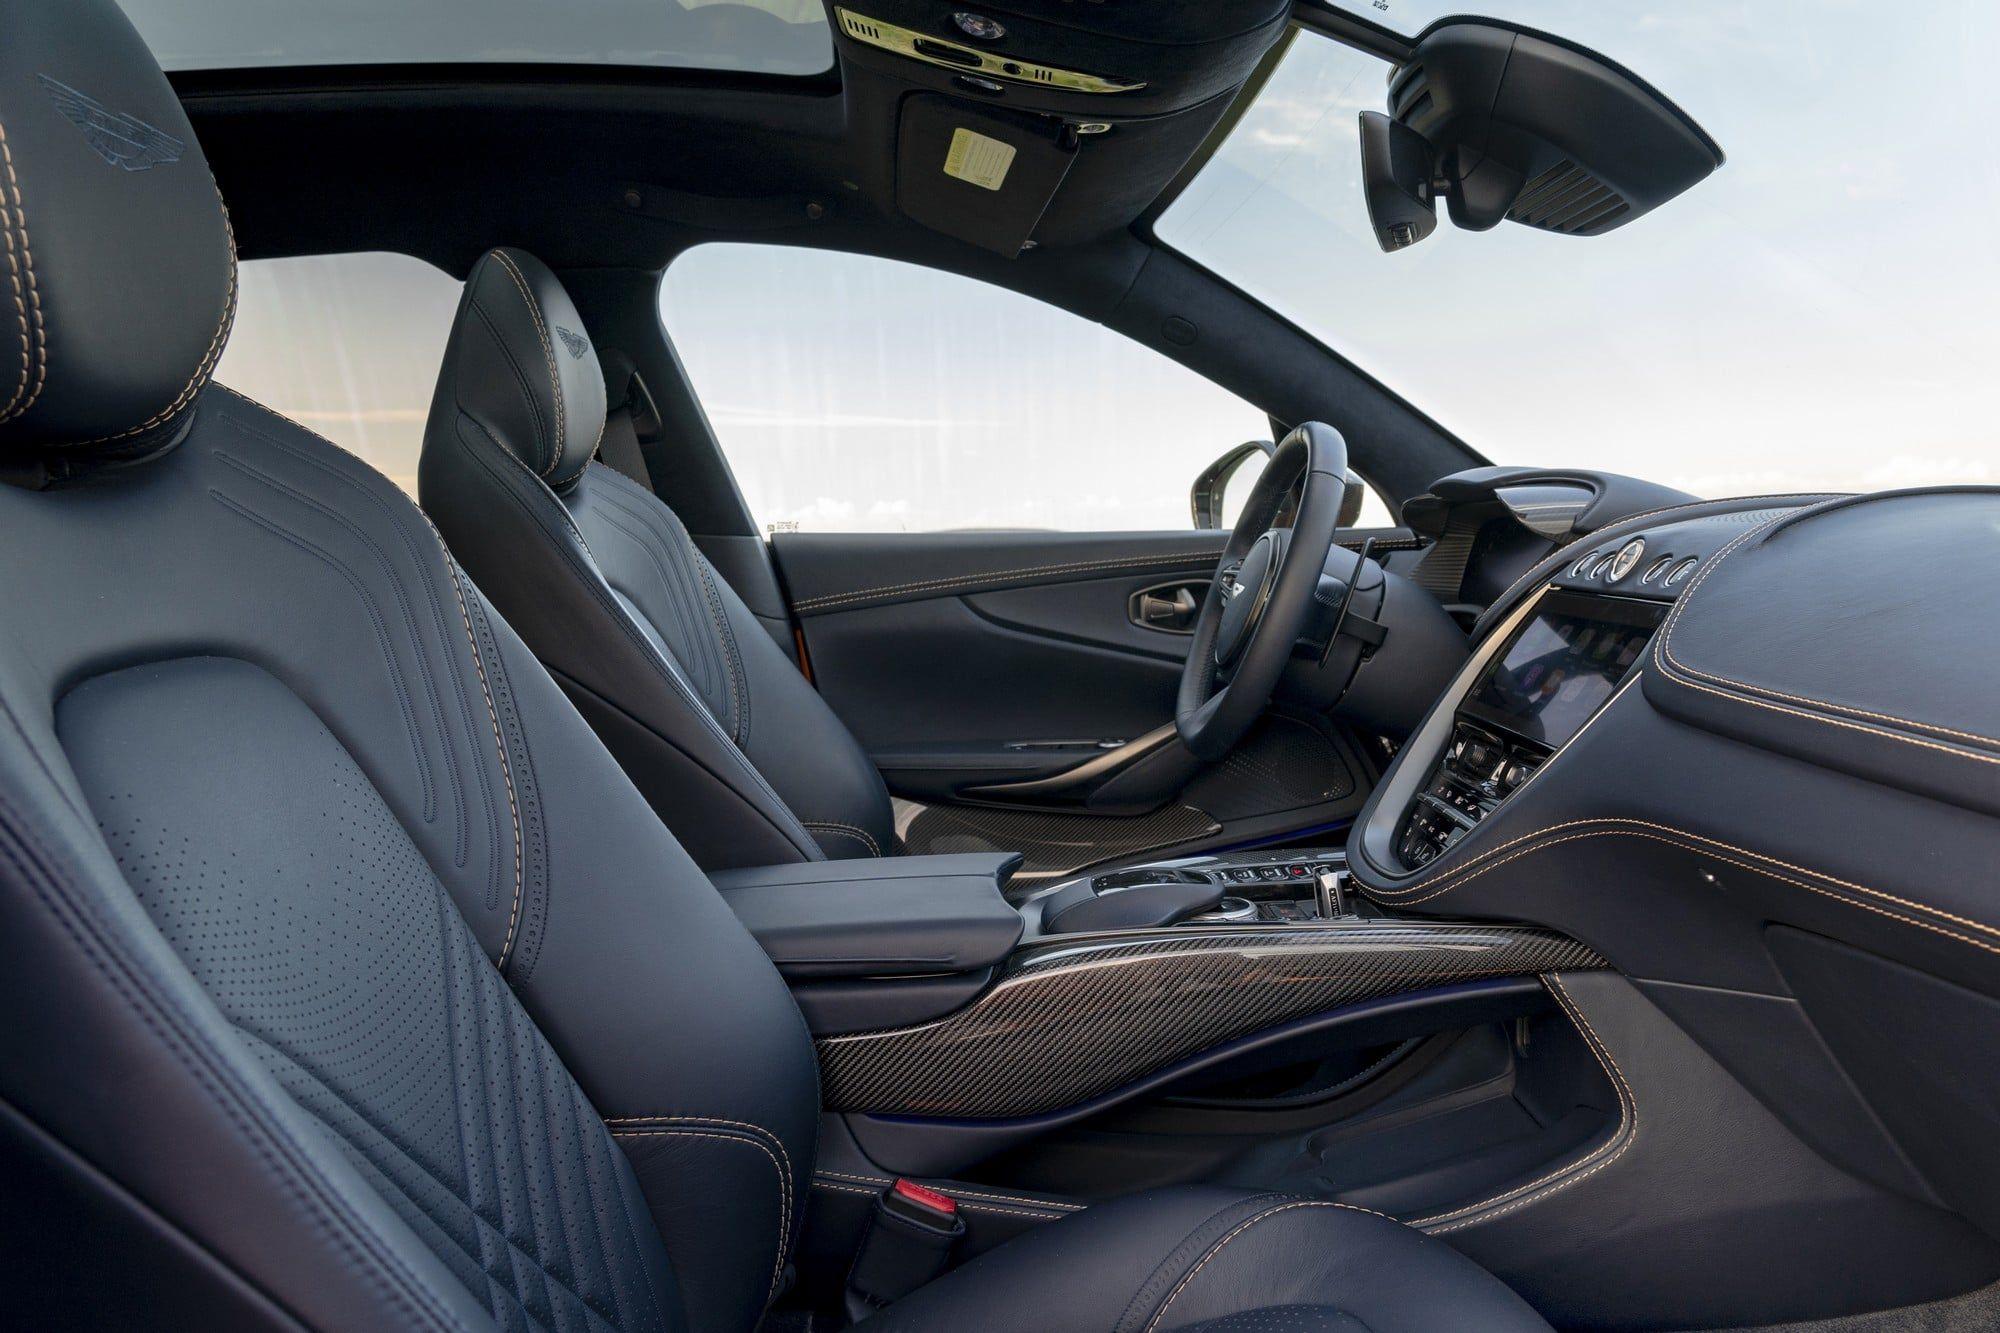 Aston martin DBX habitacle